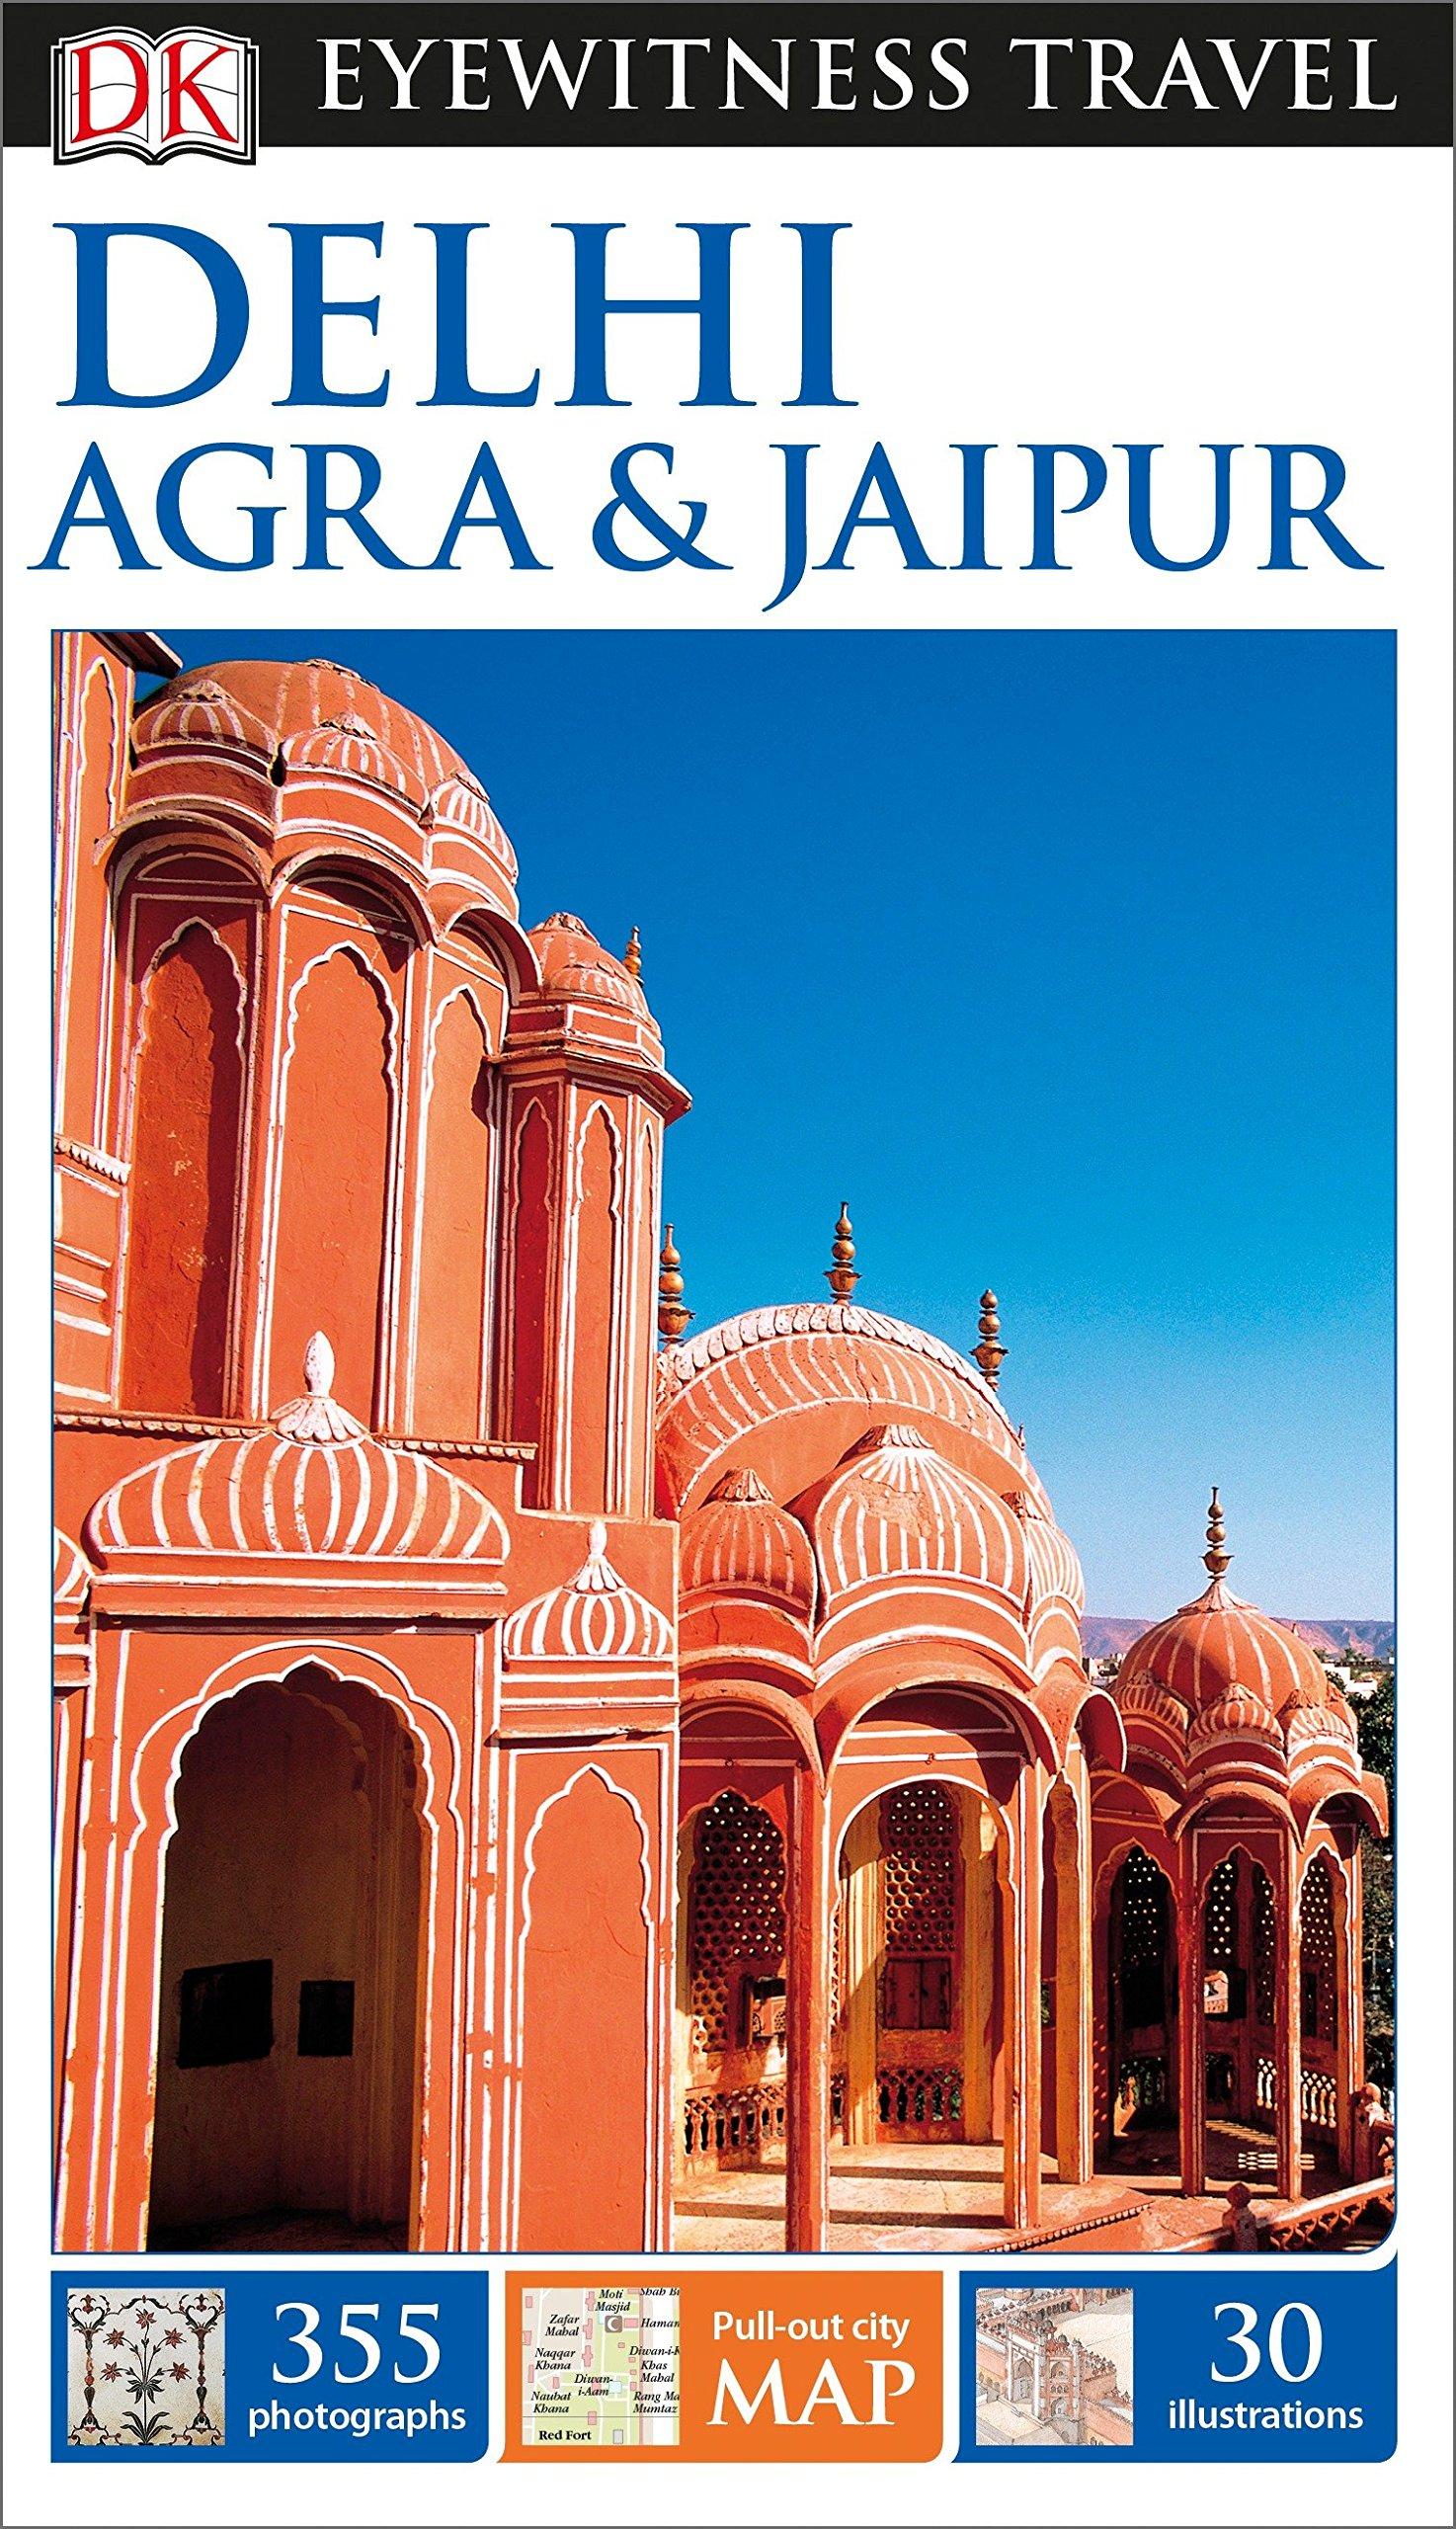 DK Eyewitness Travel Guide Delhi, Agra and Jaipur (DK Eyewitness Travel Guides)